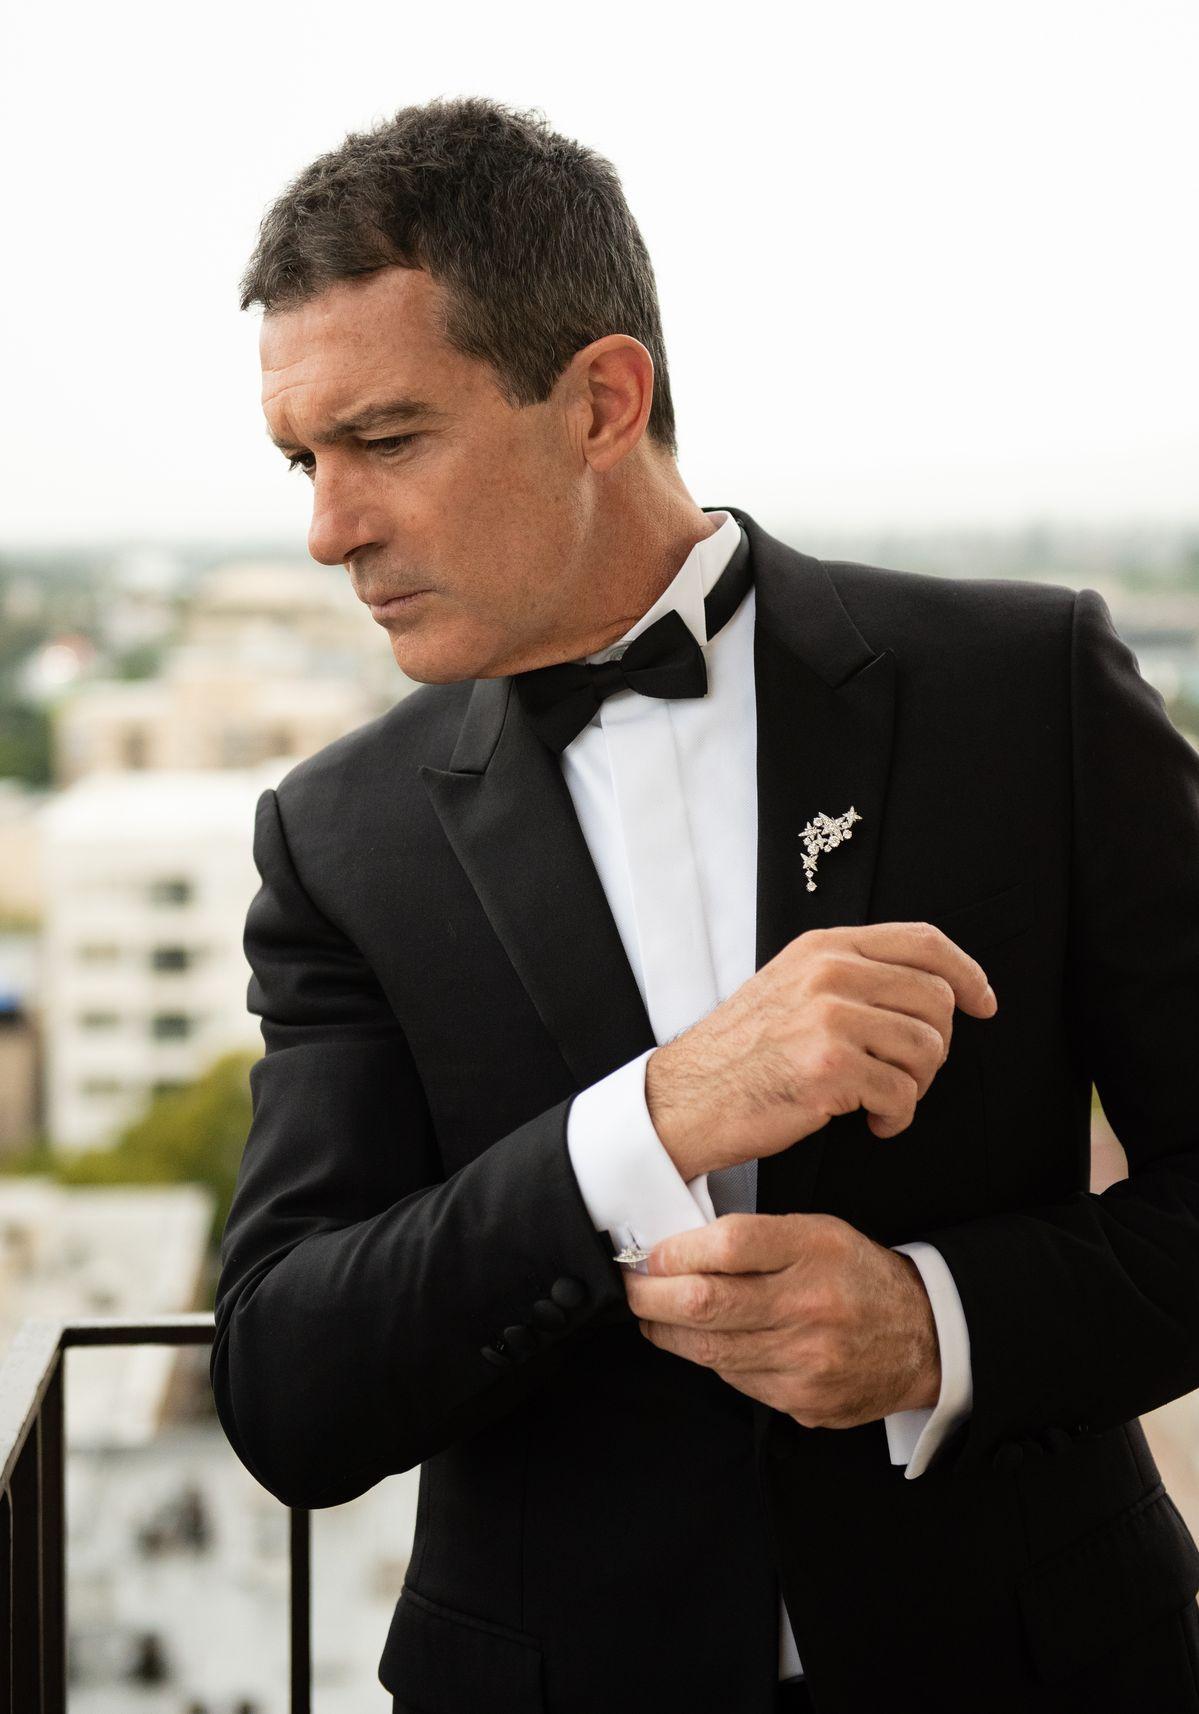 Antonio Banderas Brings Conscious Luxury to the Oscars